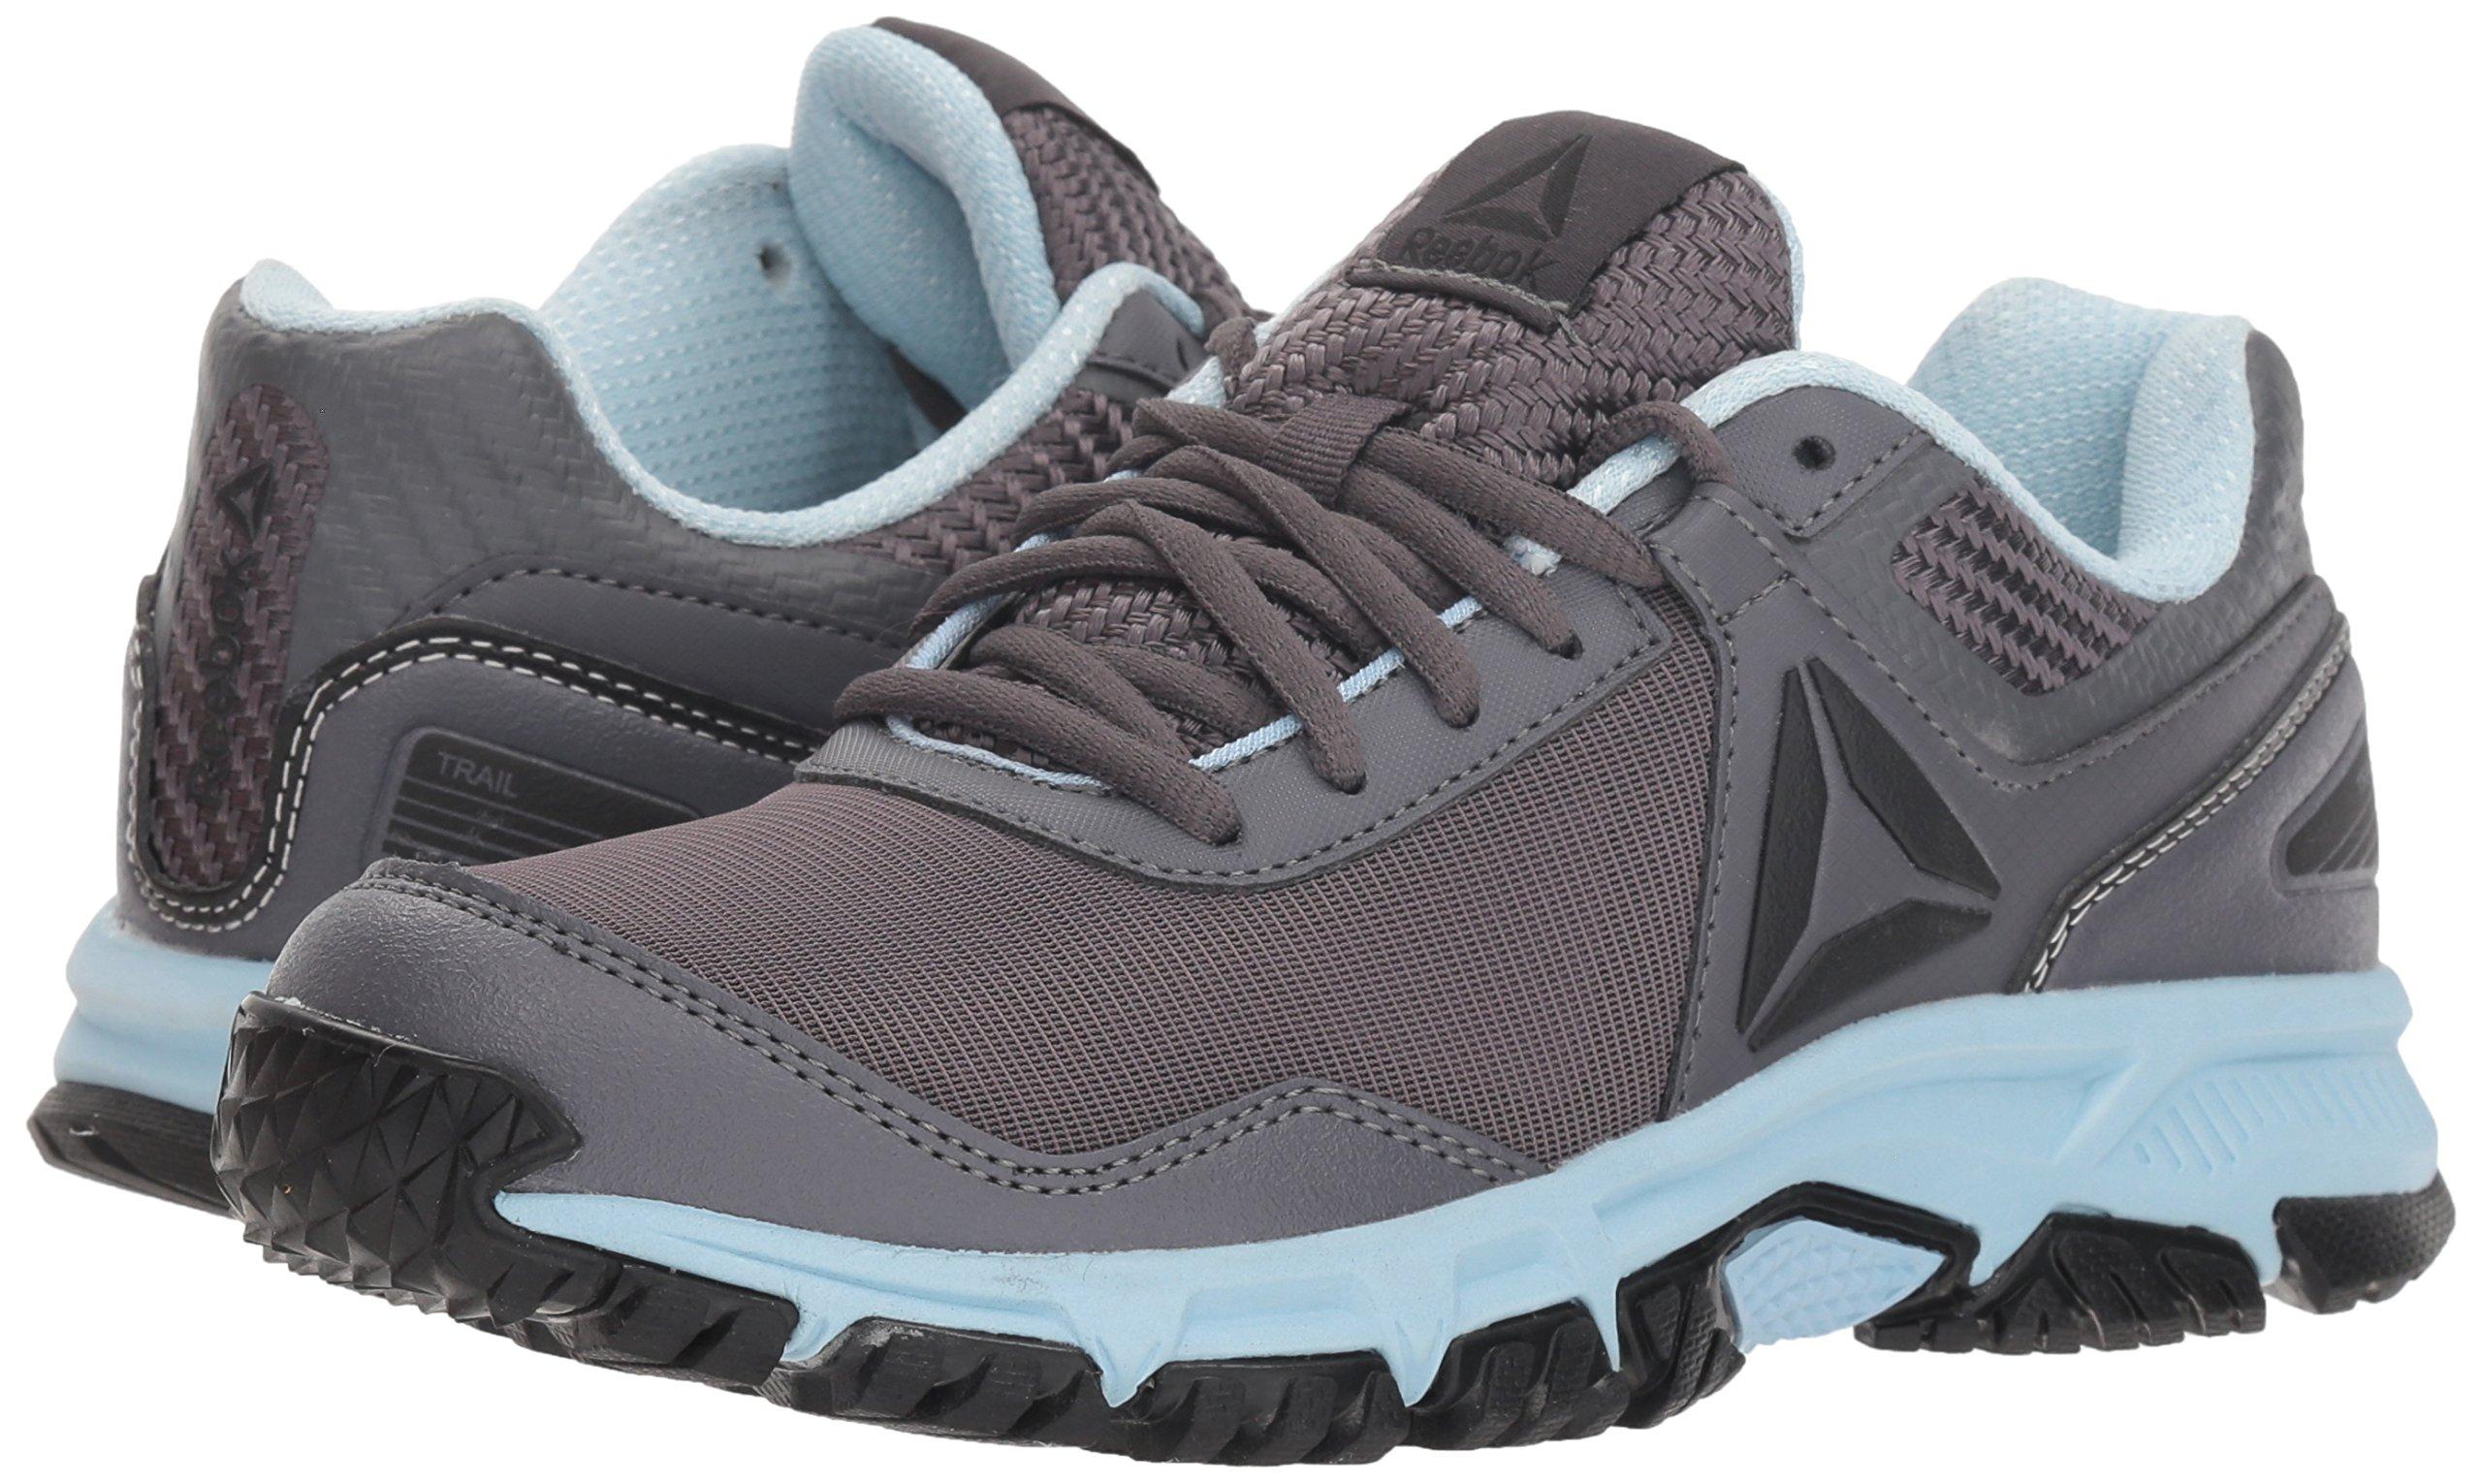 Reebok Women's Ridgerider Trail 3.0 Walking Shoe, ash Grey/Dreamy Blue/blac, 7.5 M US by Reebok (Image #5)